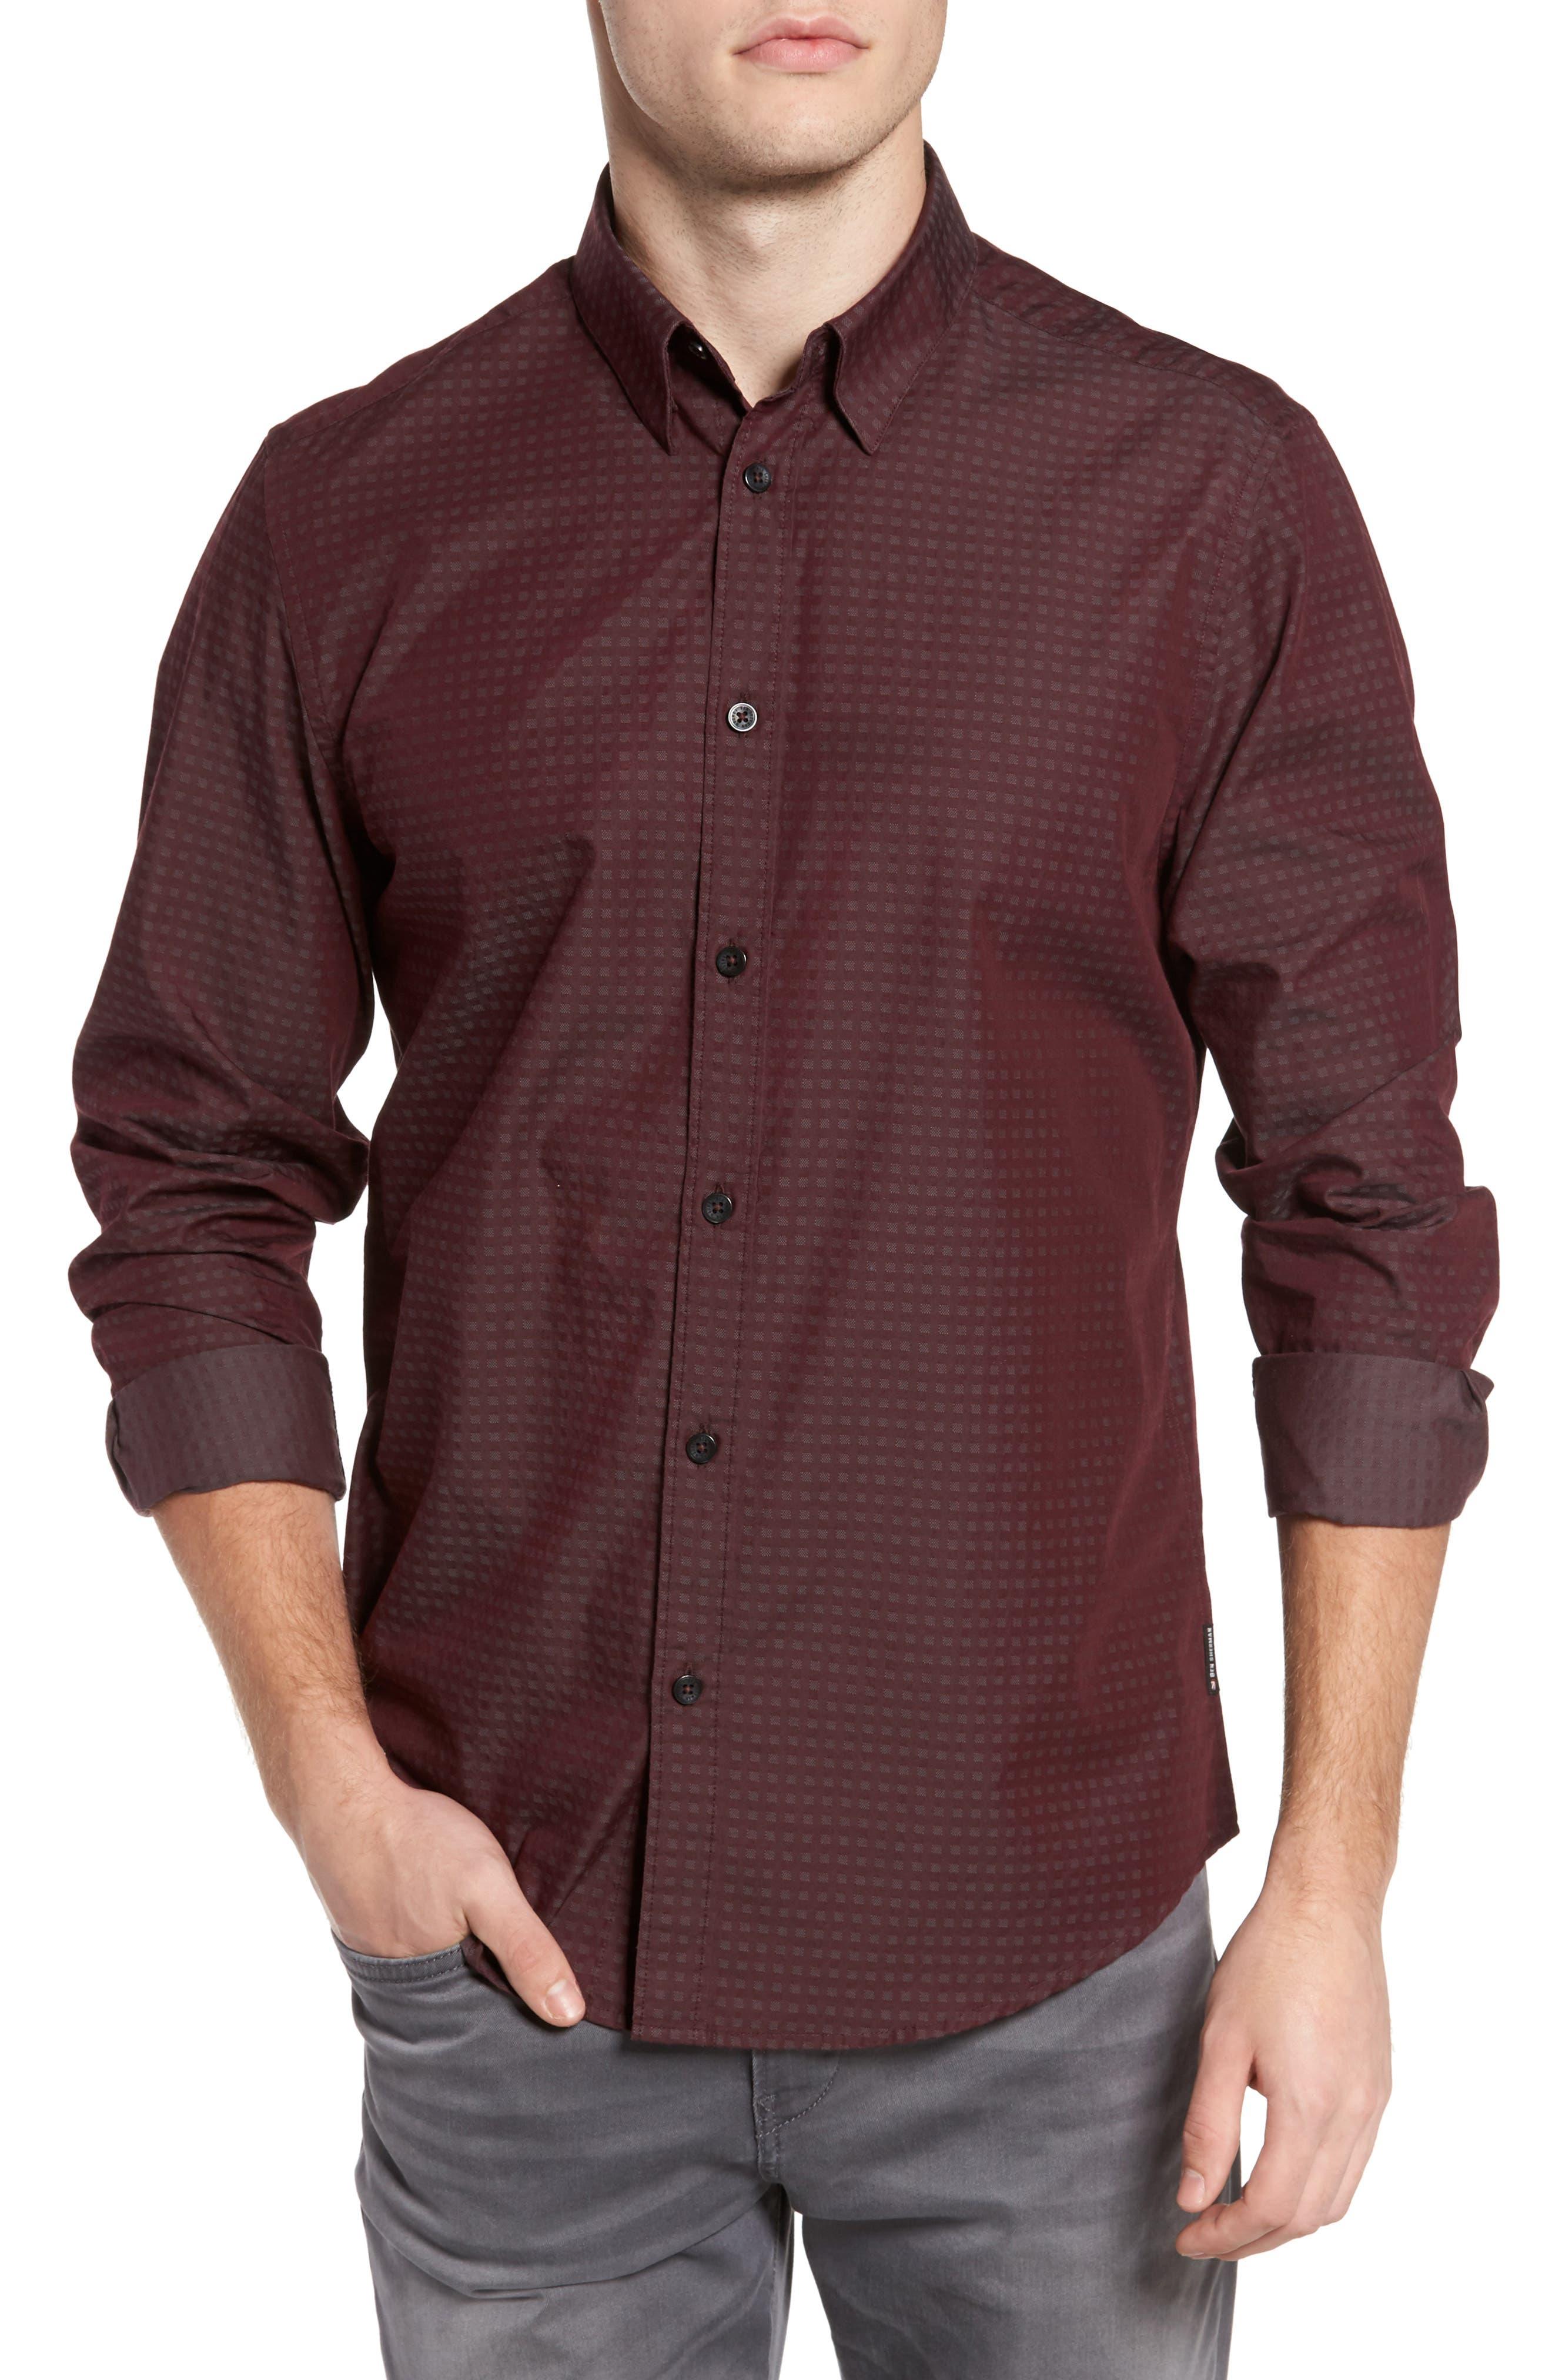 Alternate Image 1 Selected - Ben Sherman Dobby Checkerboard Woven Shirt